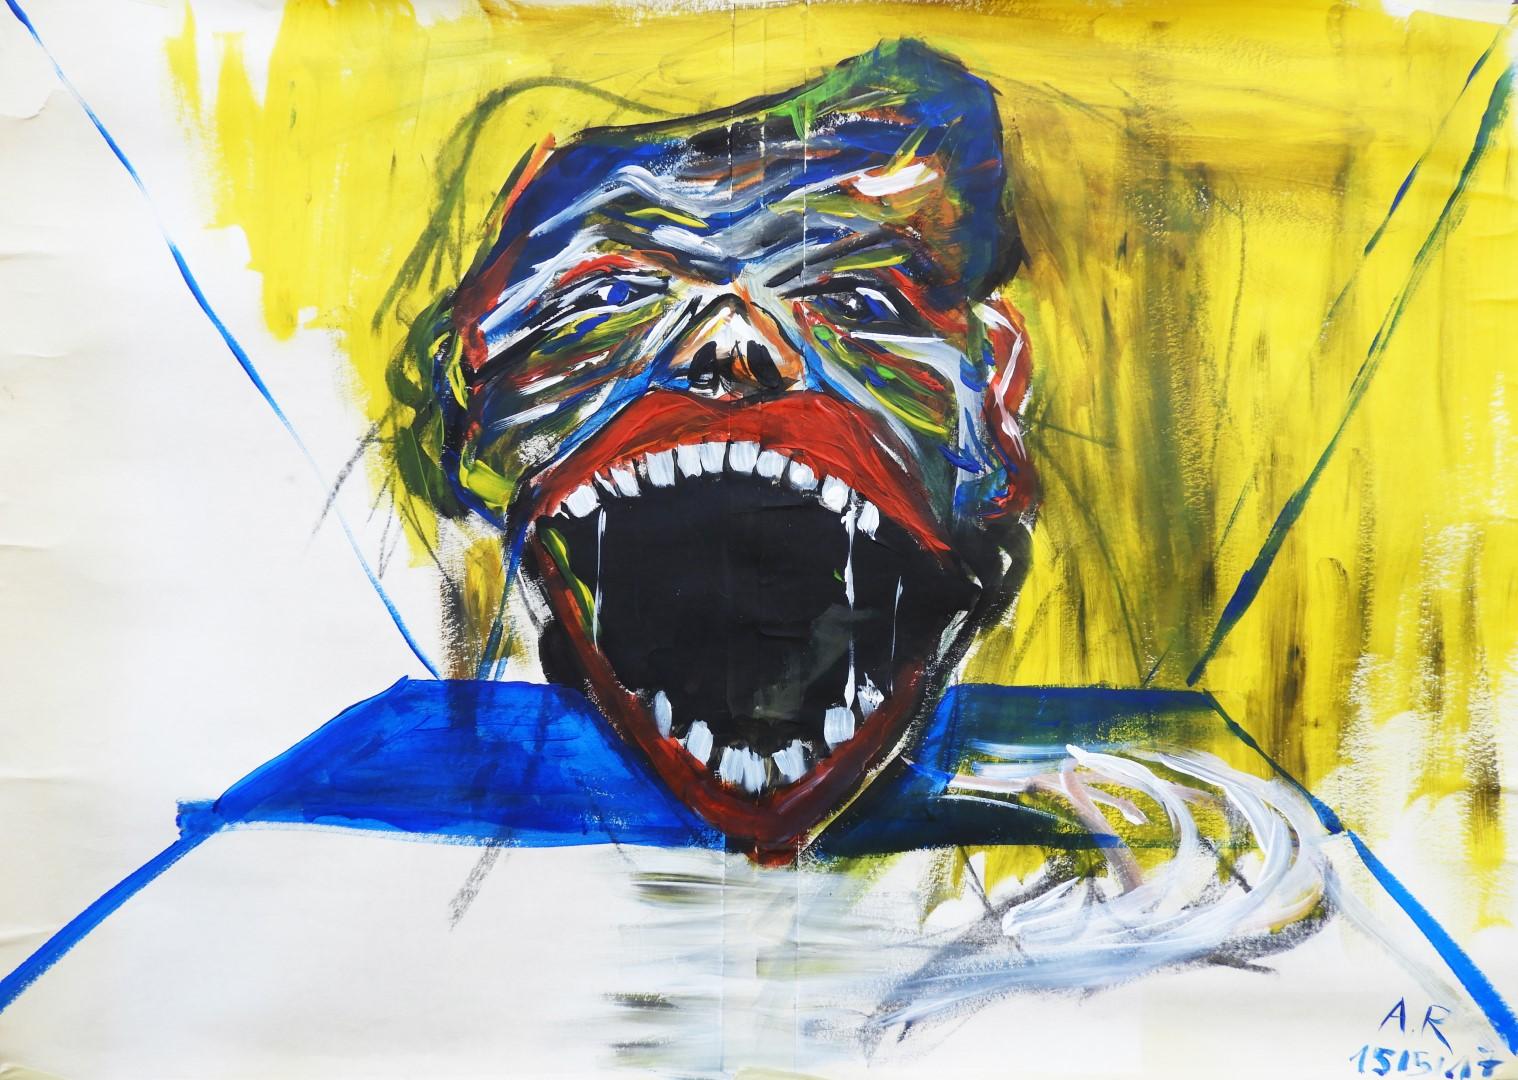 Acrylic on paper, 58x81cm